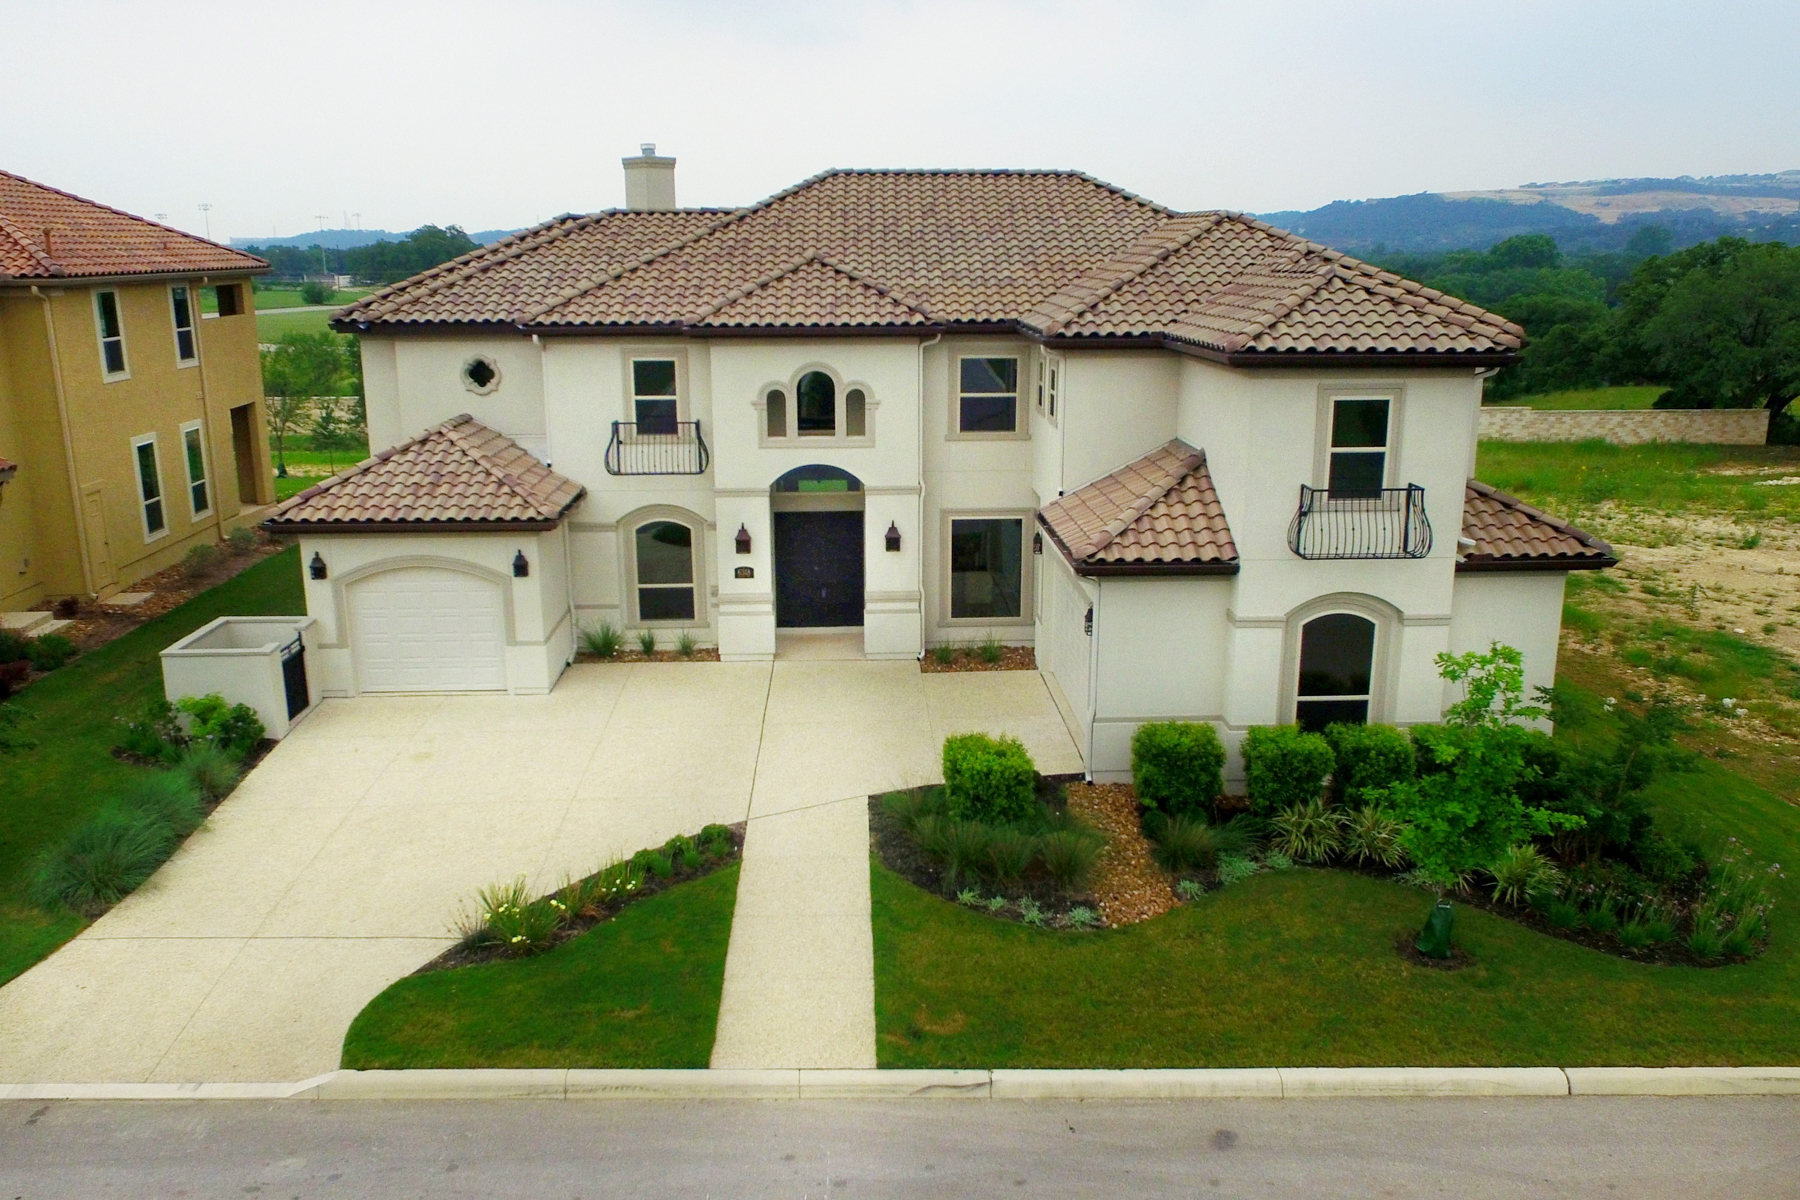 Maison unifamiliale pour l Vente à Stunning Mediterranean Estate in The Dominion 6318 Sevilla Way The Dominion, San Antonio, Texas, 78257 États-Unis